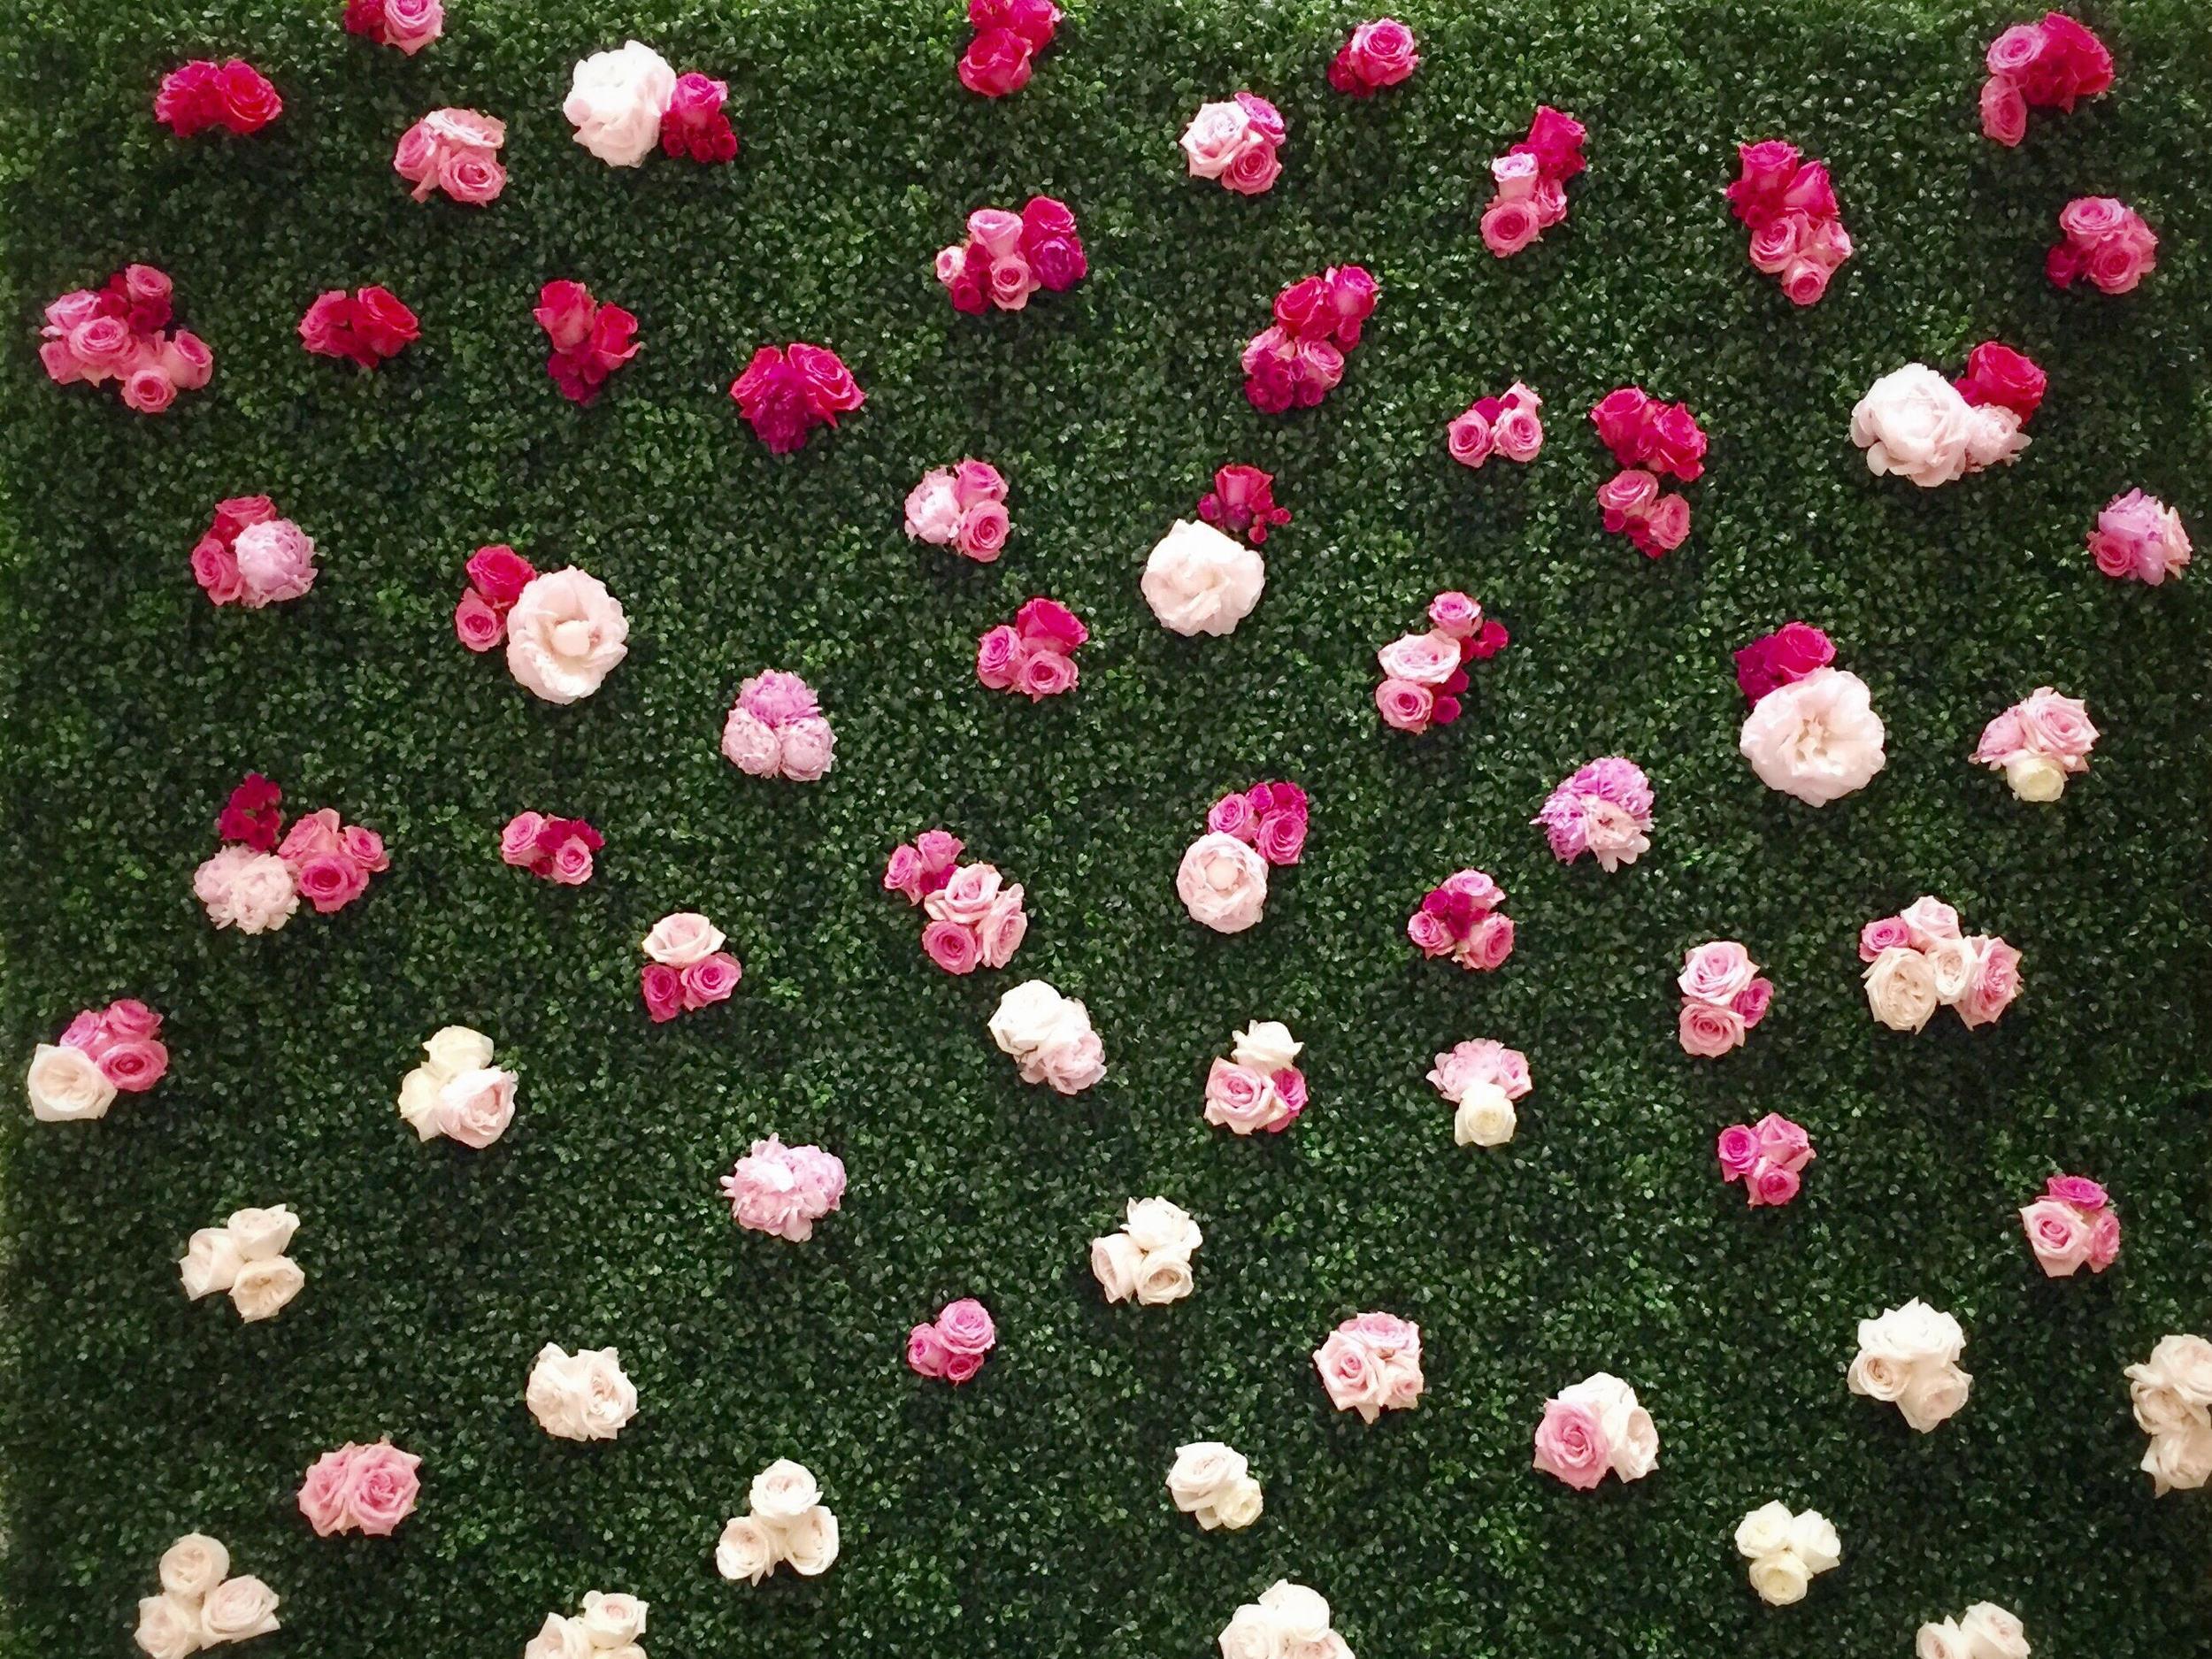 Curate-Aftin-Dan-Boxwood-Florals.jpg